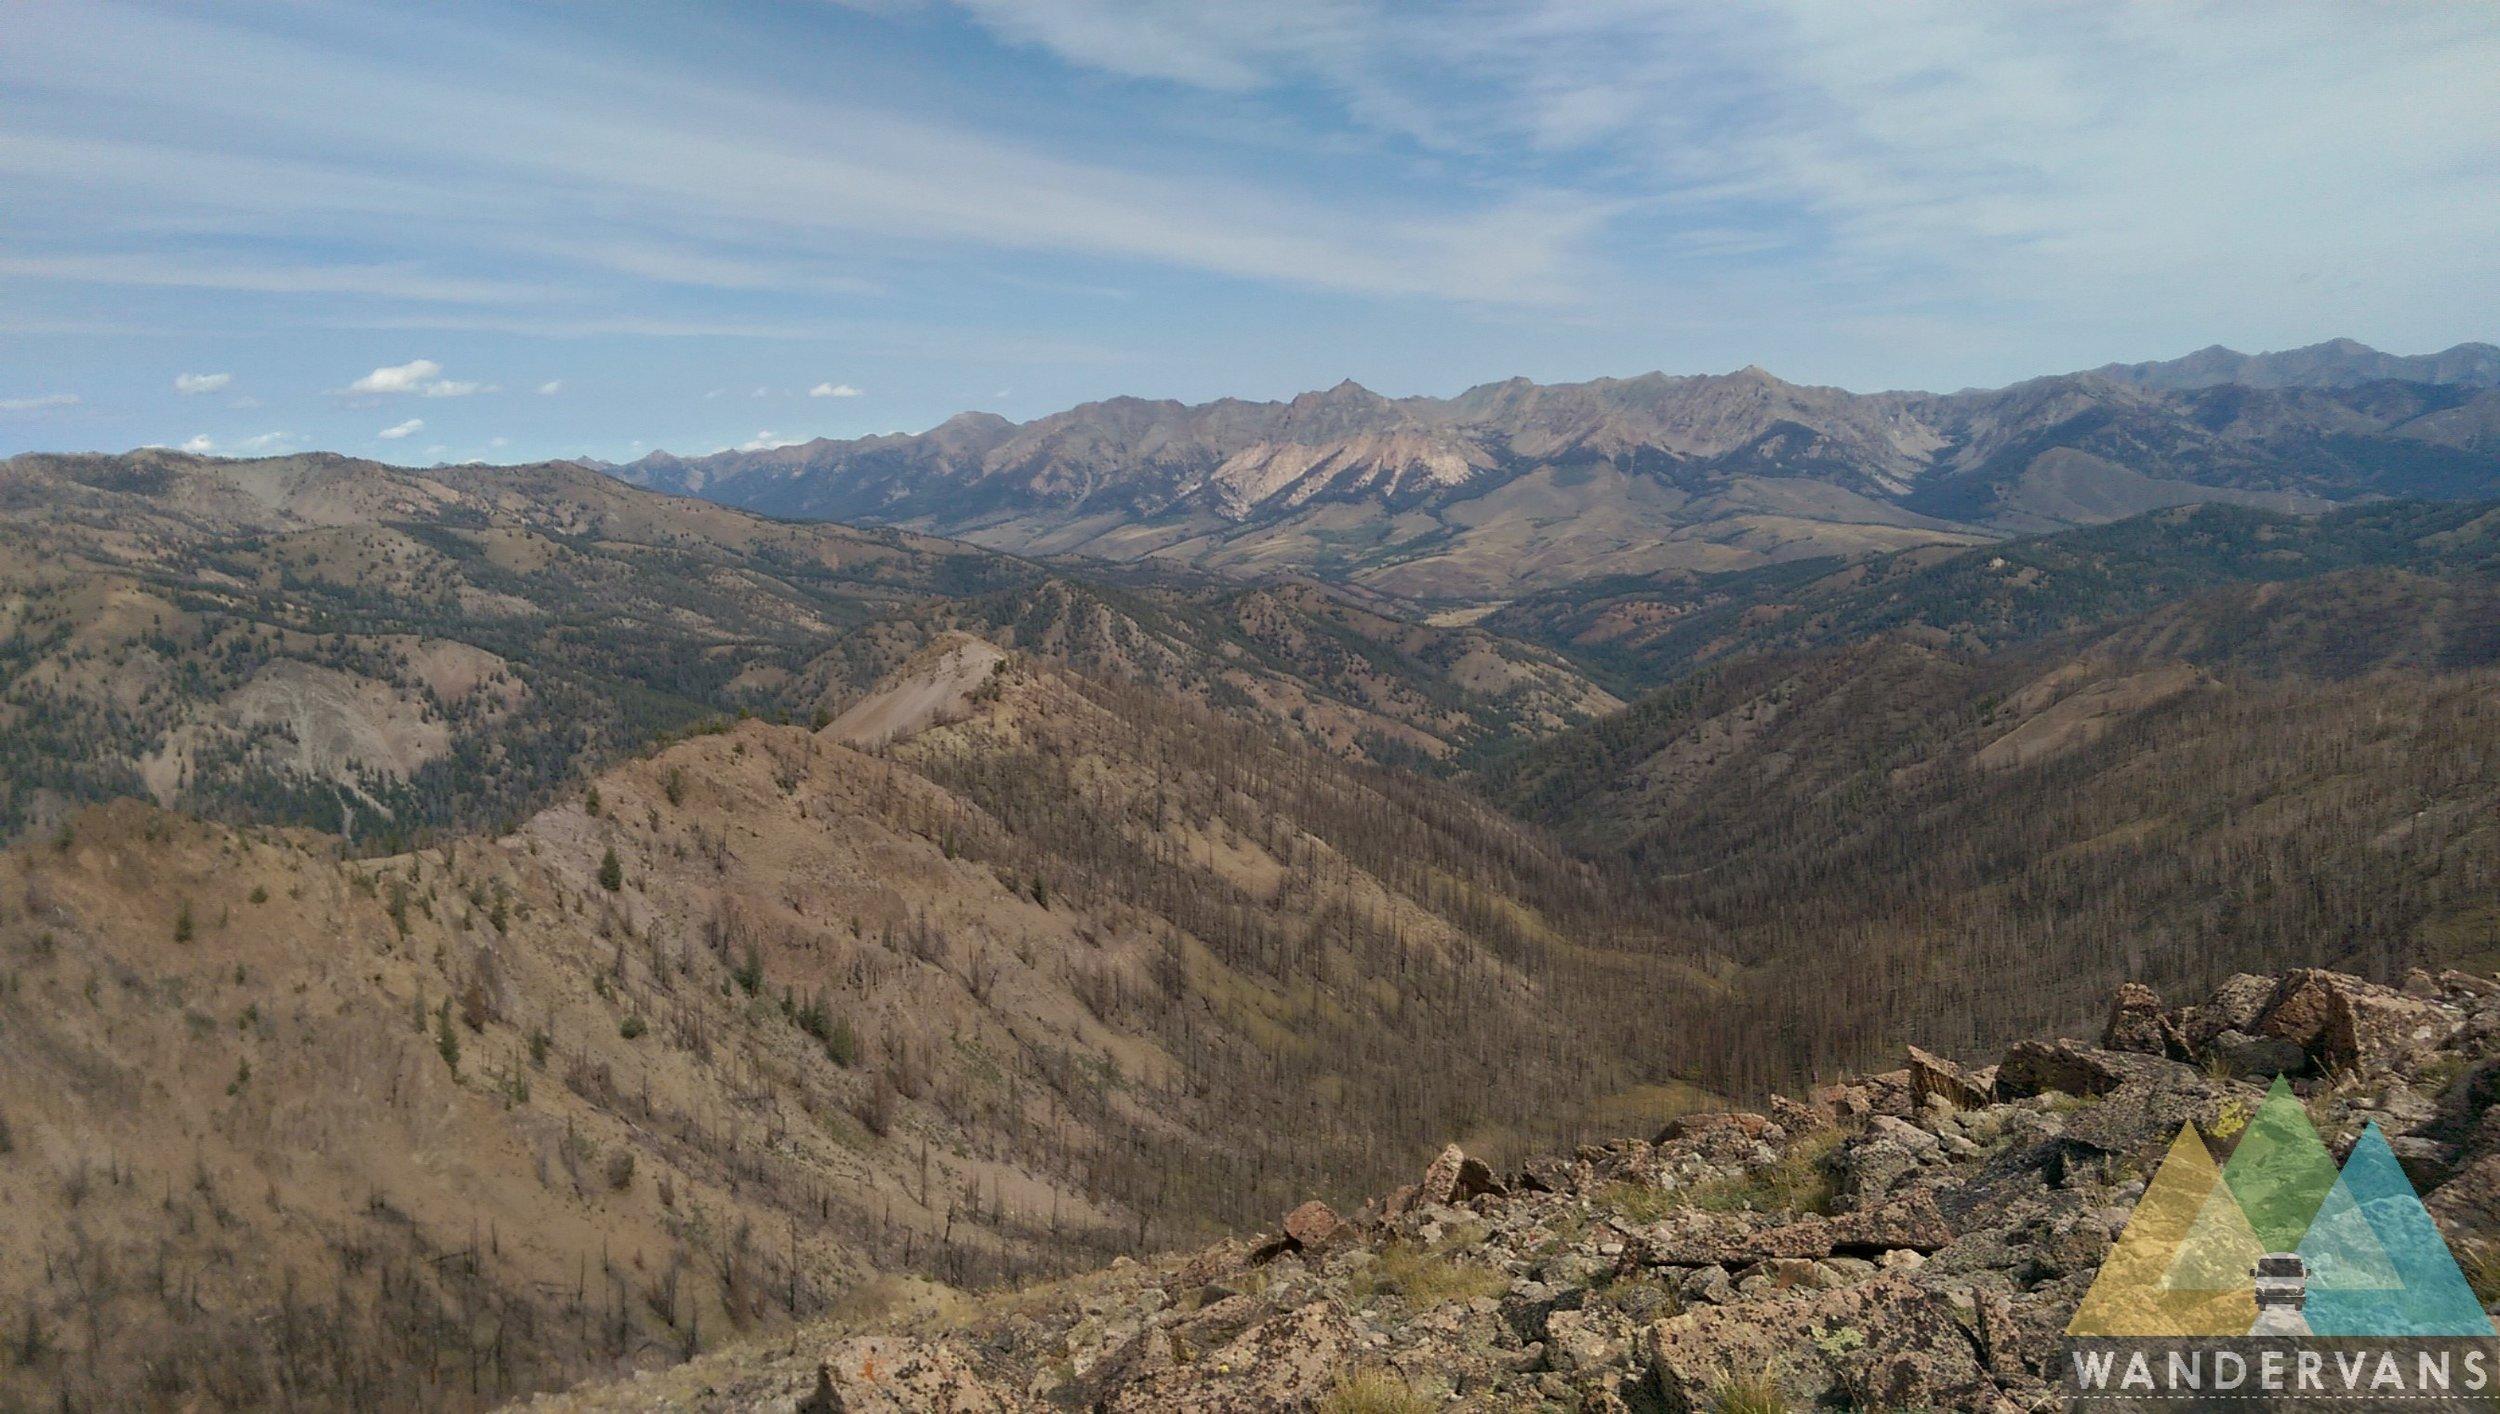 vanlife-rv-campervan-rent-idaho-sun-valley-boise-wandervans-wanderlust-skiing-backcountry-snowboard-sawtooth-sun-valley-biking-hiking